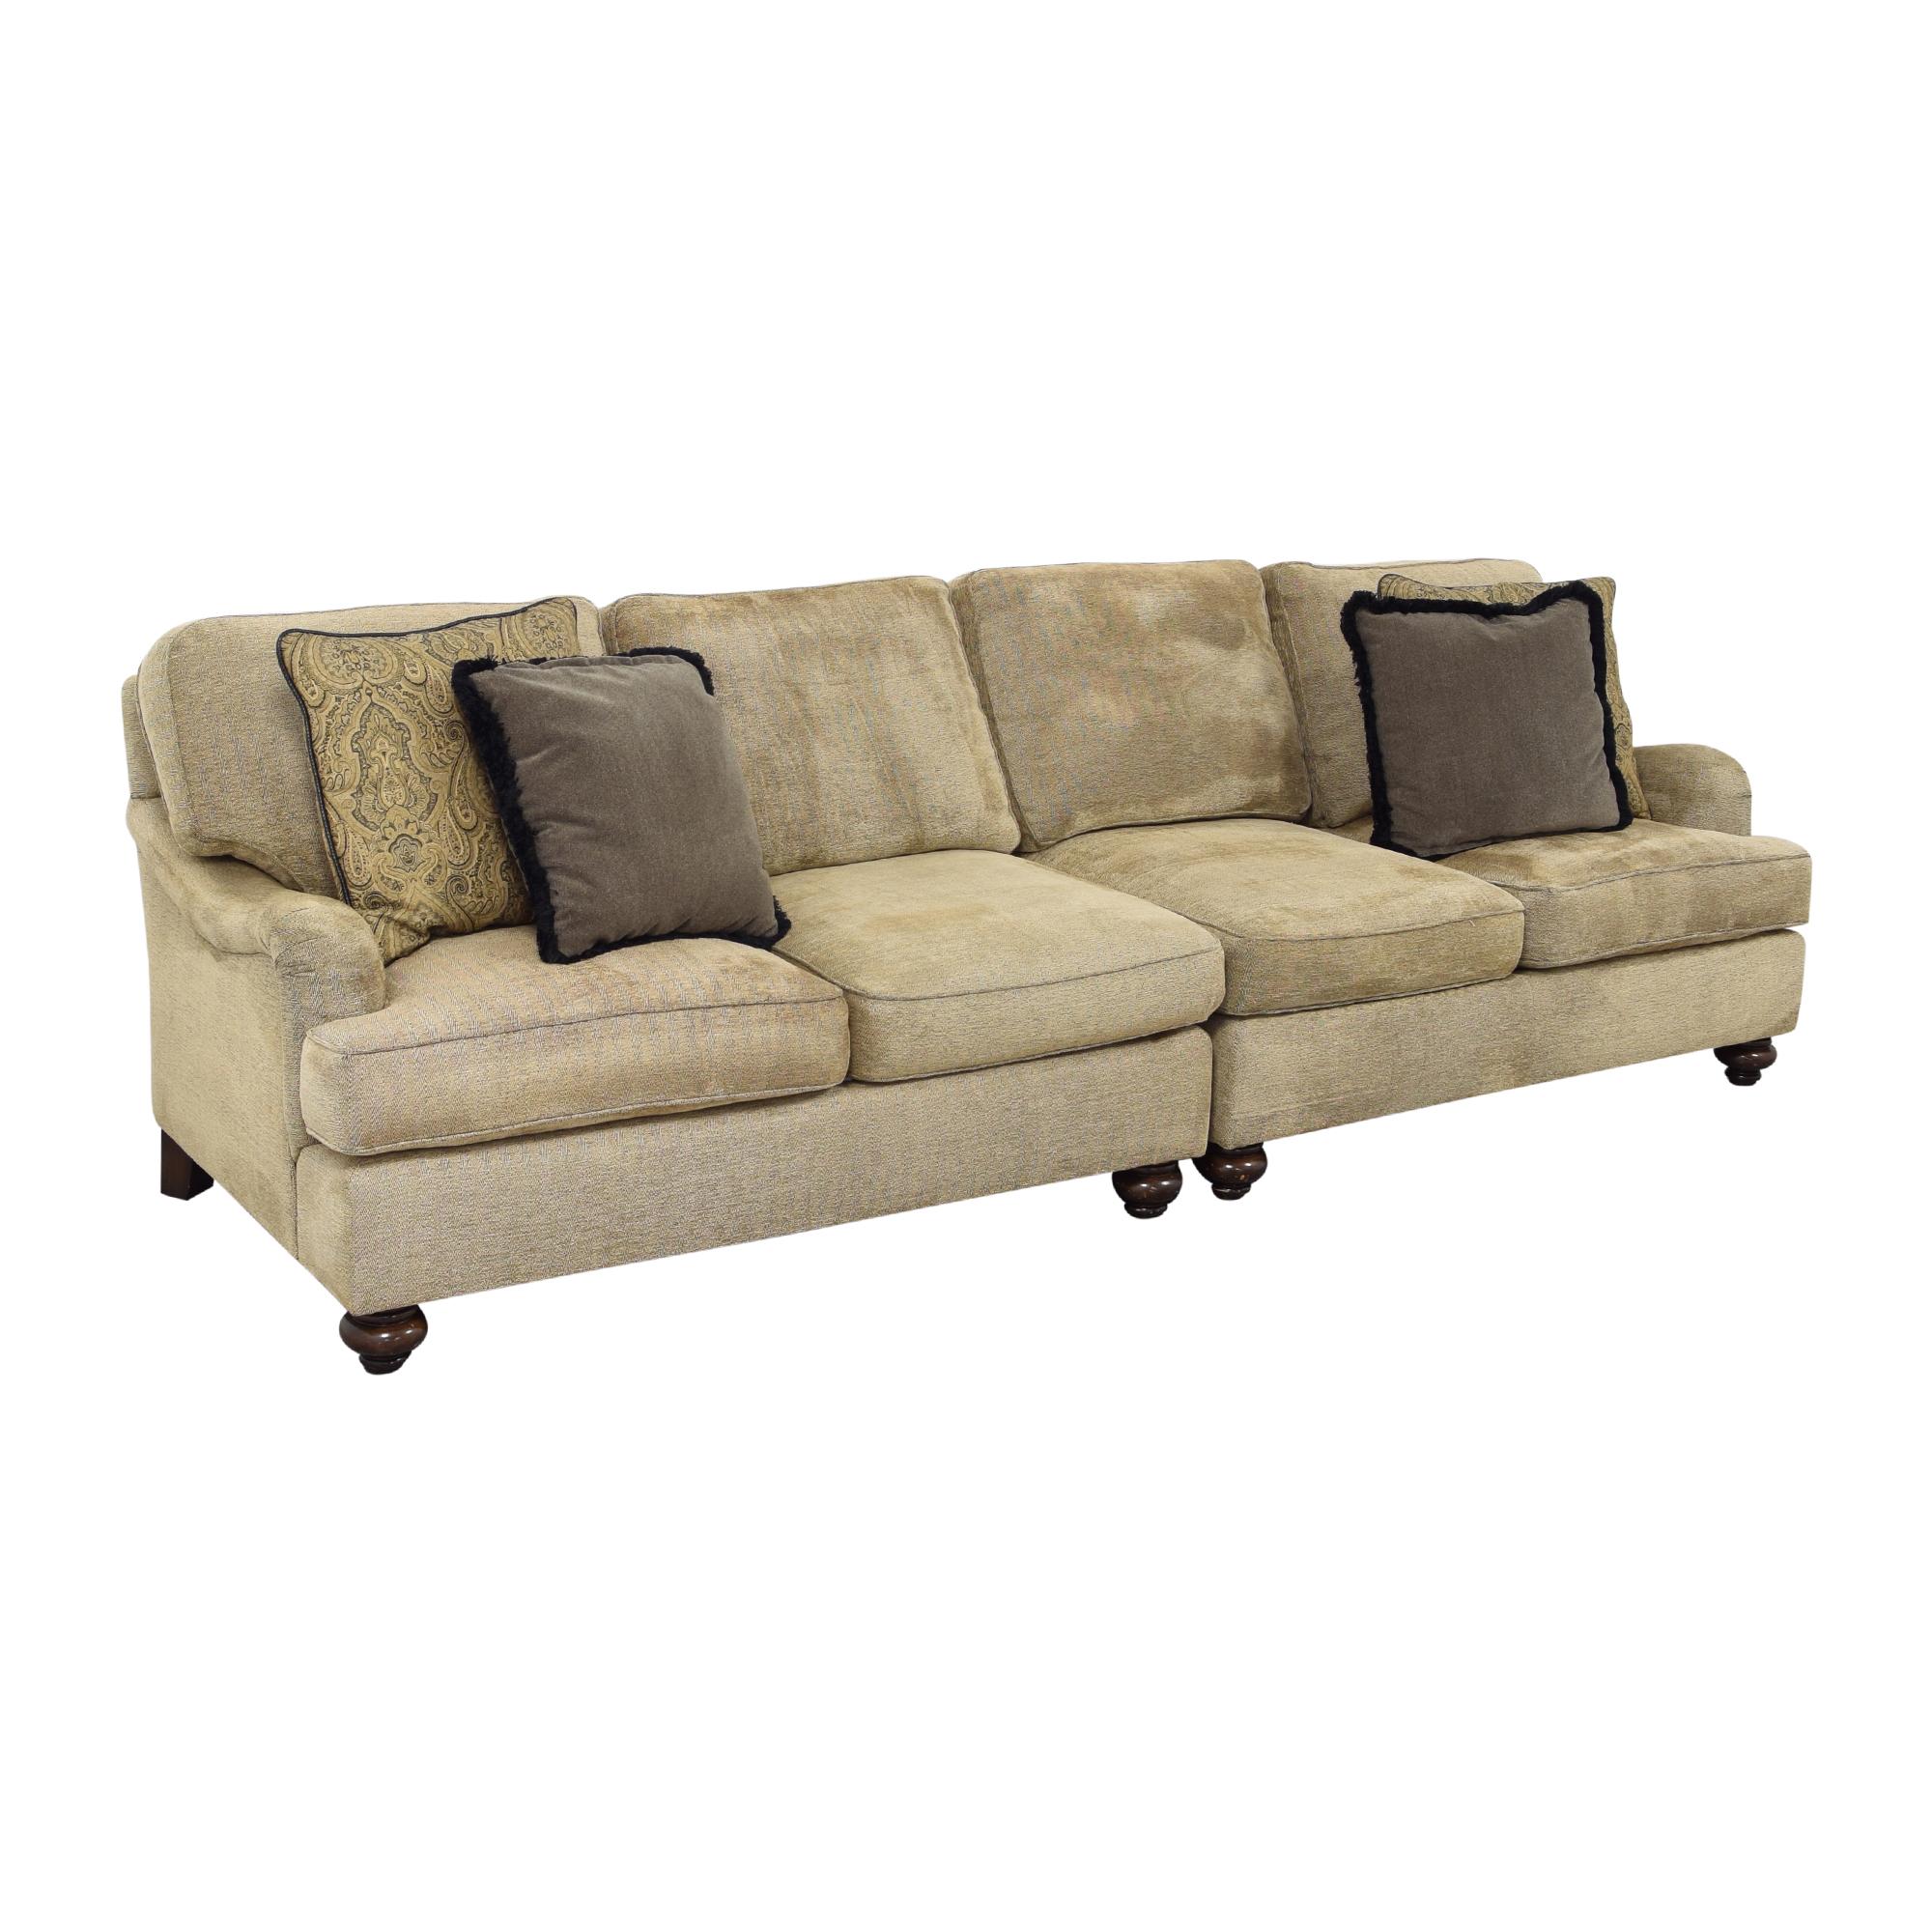 buy Henredon Furniture Henredon Furniture Mid-Century Modern Couch online